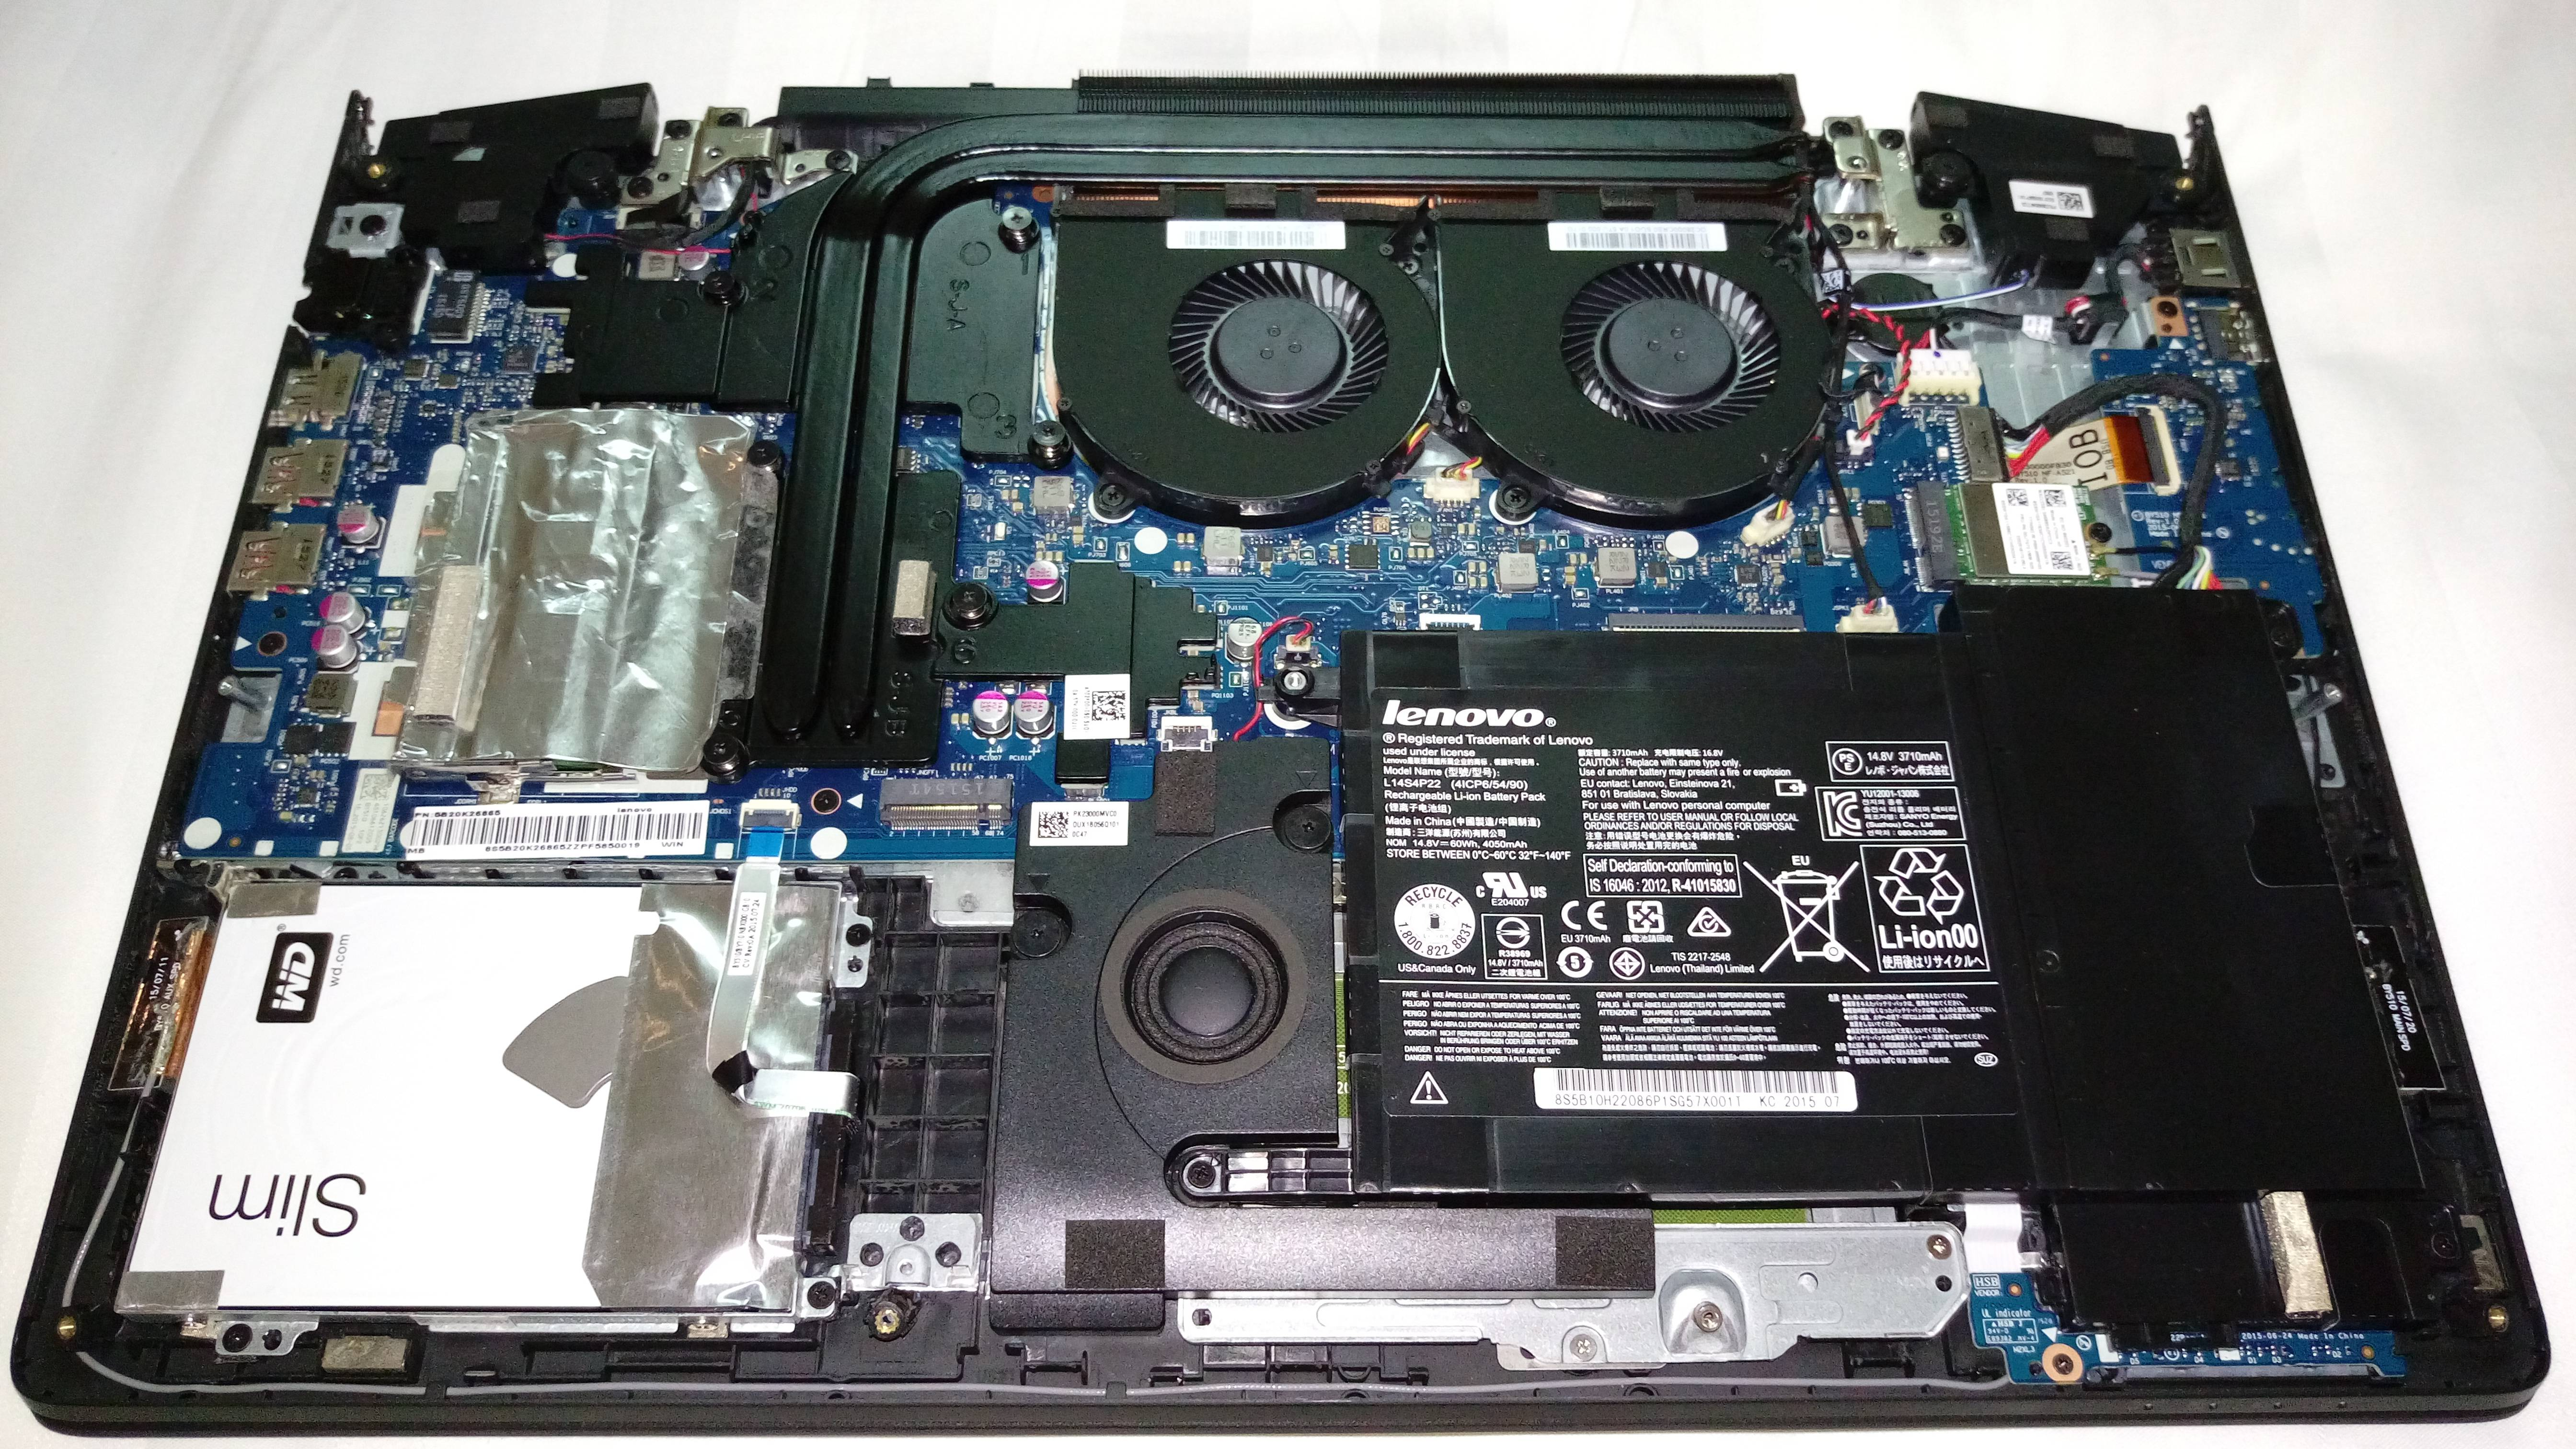 Carrizo volles HSA UVD6 VCE3 1 ACP2 HDMI 2 0 und SOC aber immernoch DDR3 [Archiv] Seite 5 Planet 3DNow Forum